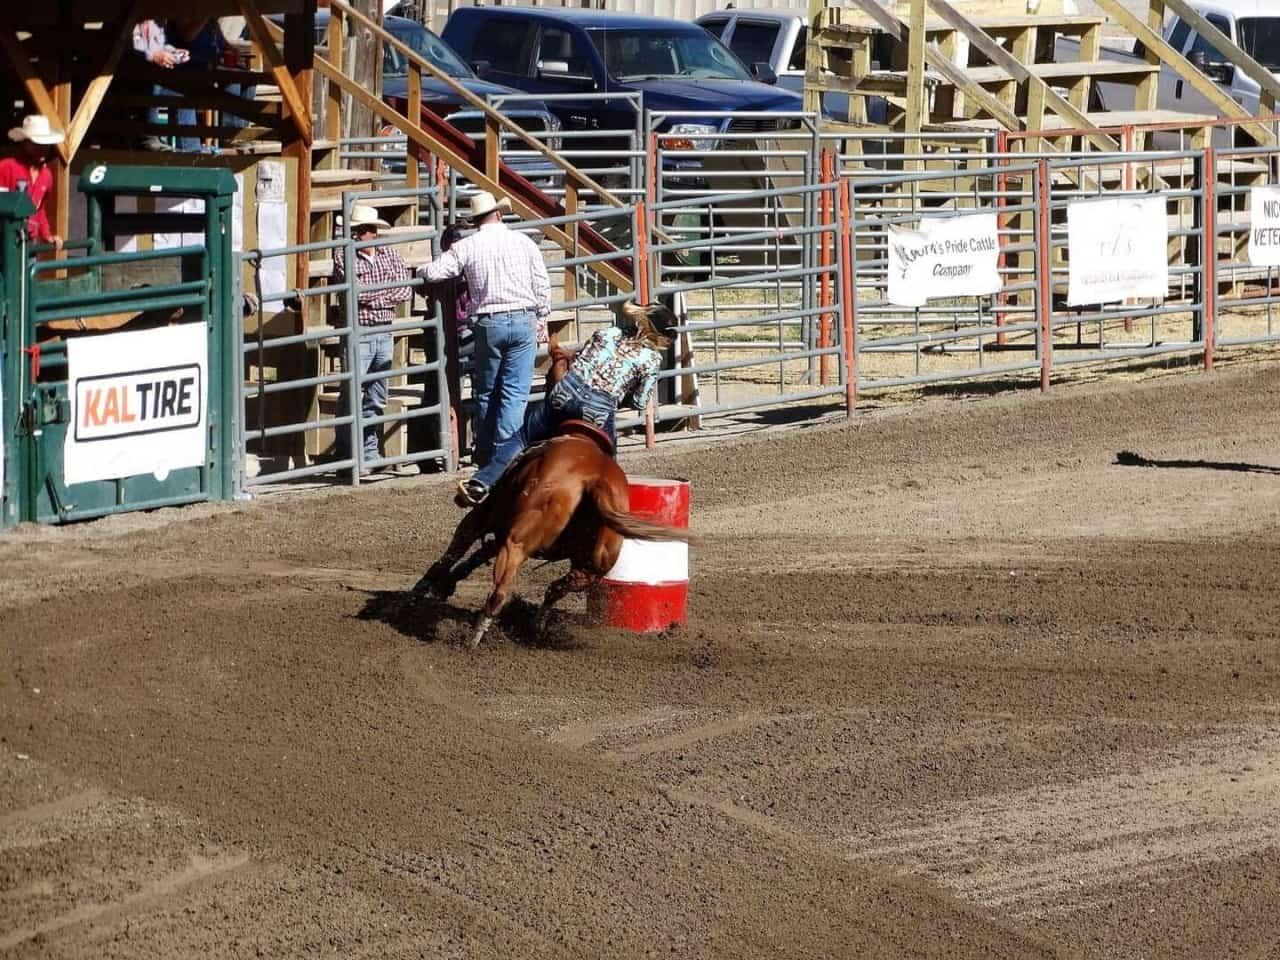 Nicola Valley Pro Rodeo Merritt BC.